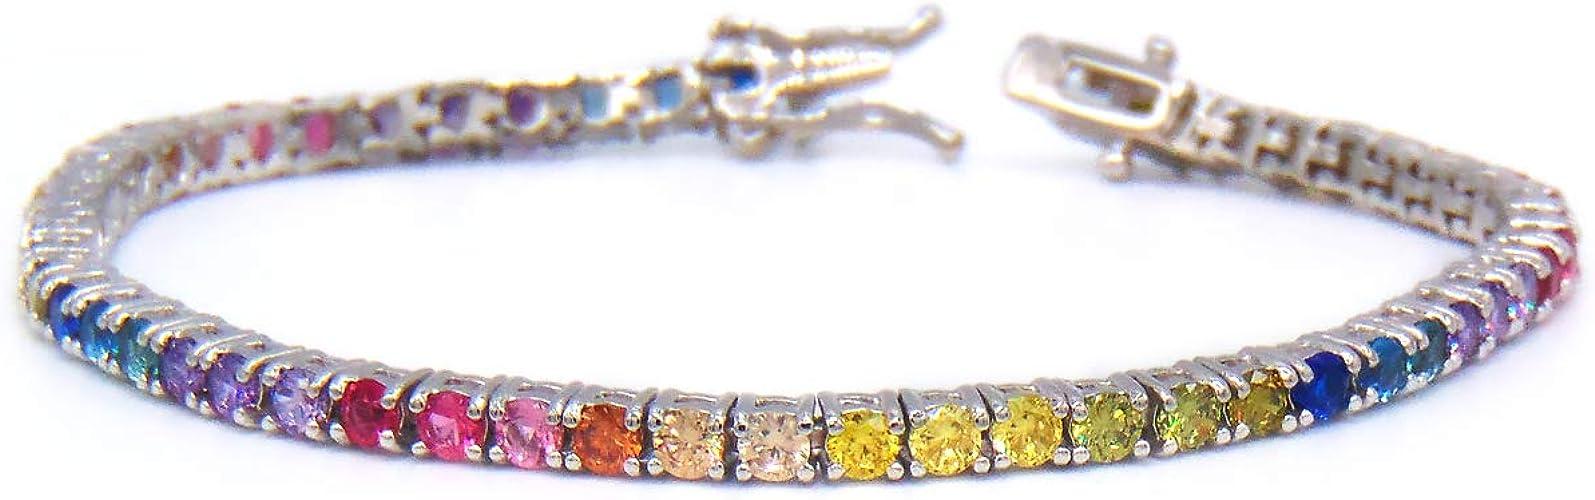 Multicolor CZ Rainbow Round Cut Tennis Bracelet 14K Yellow Gold Over Silver 925